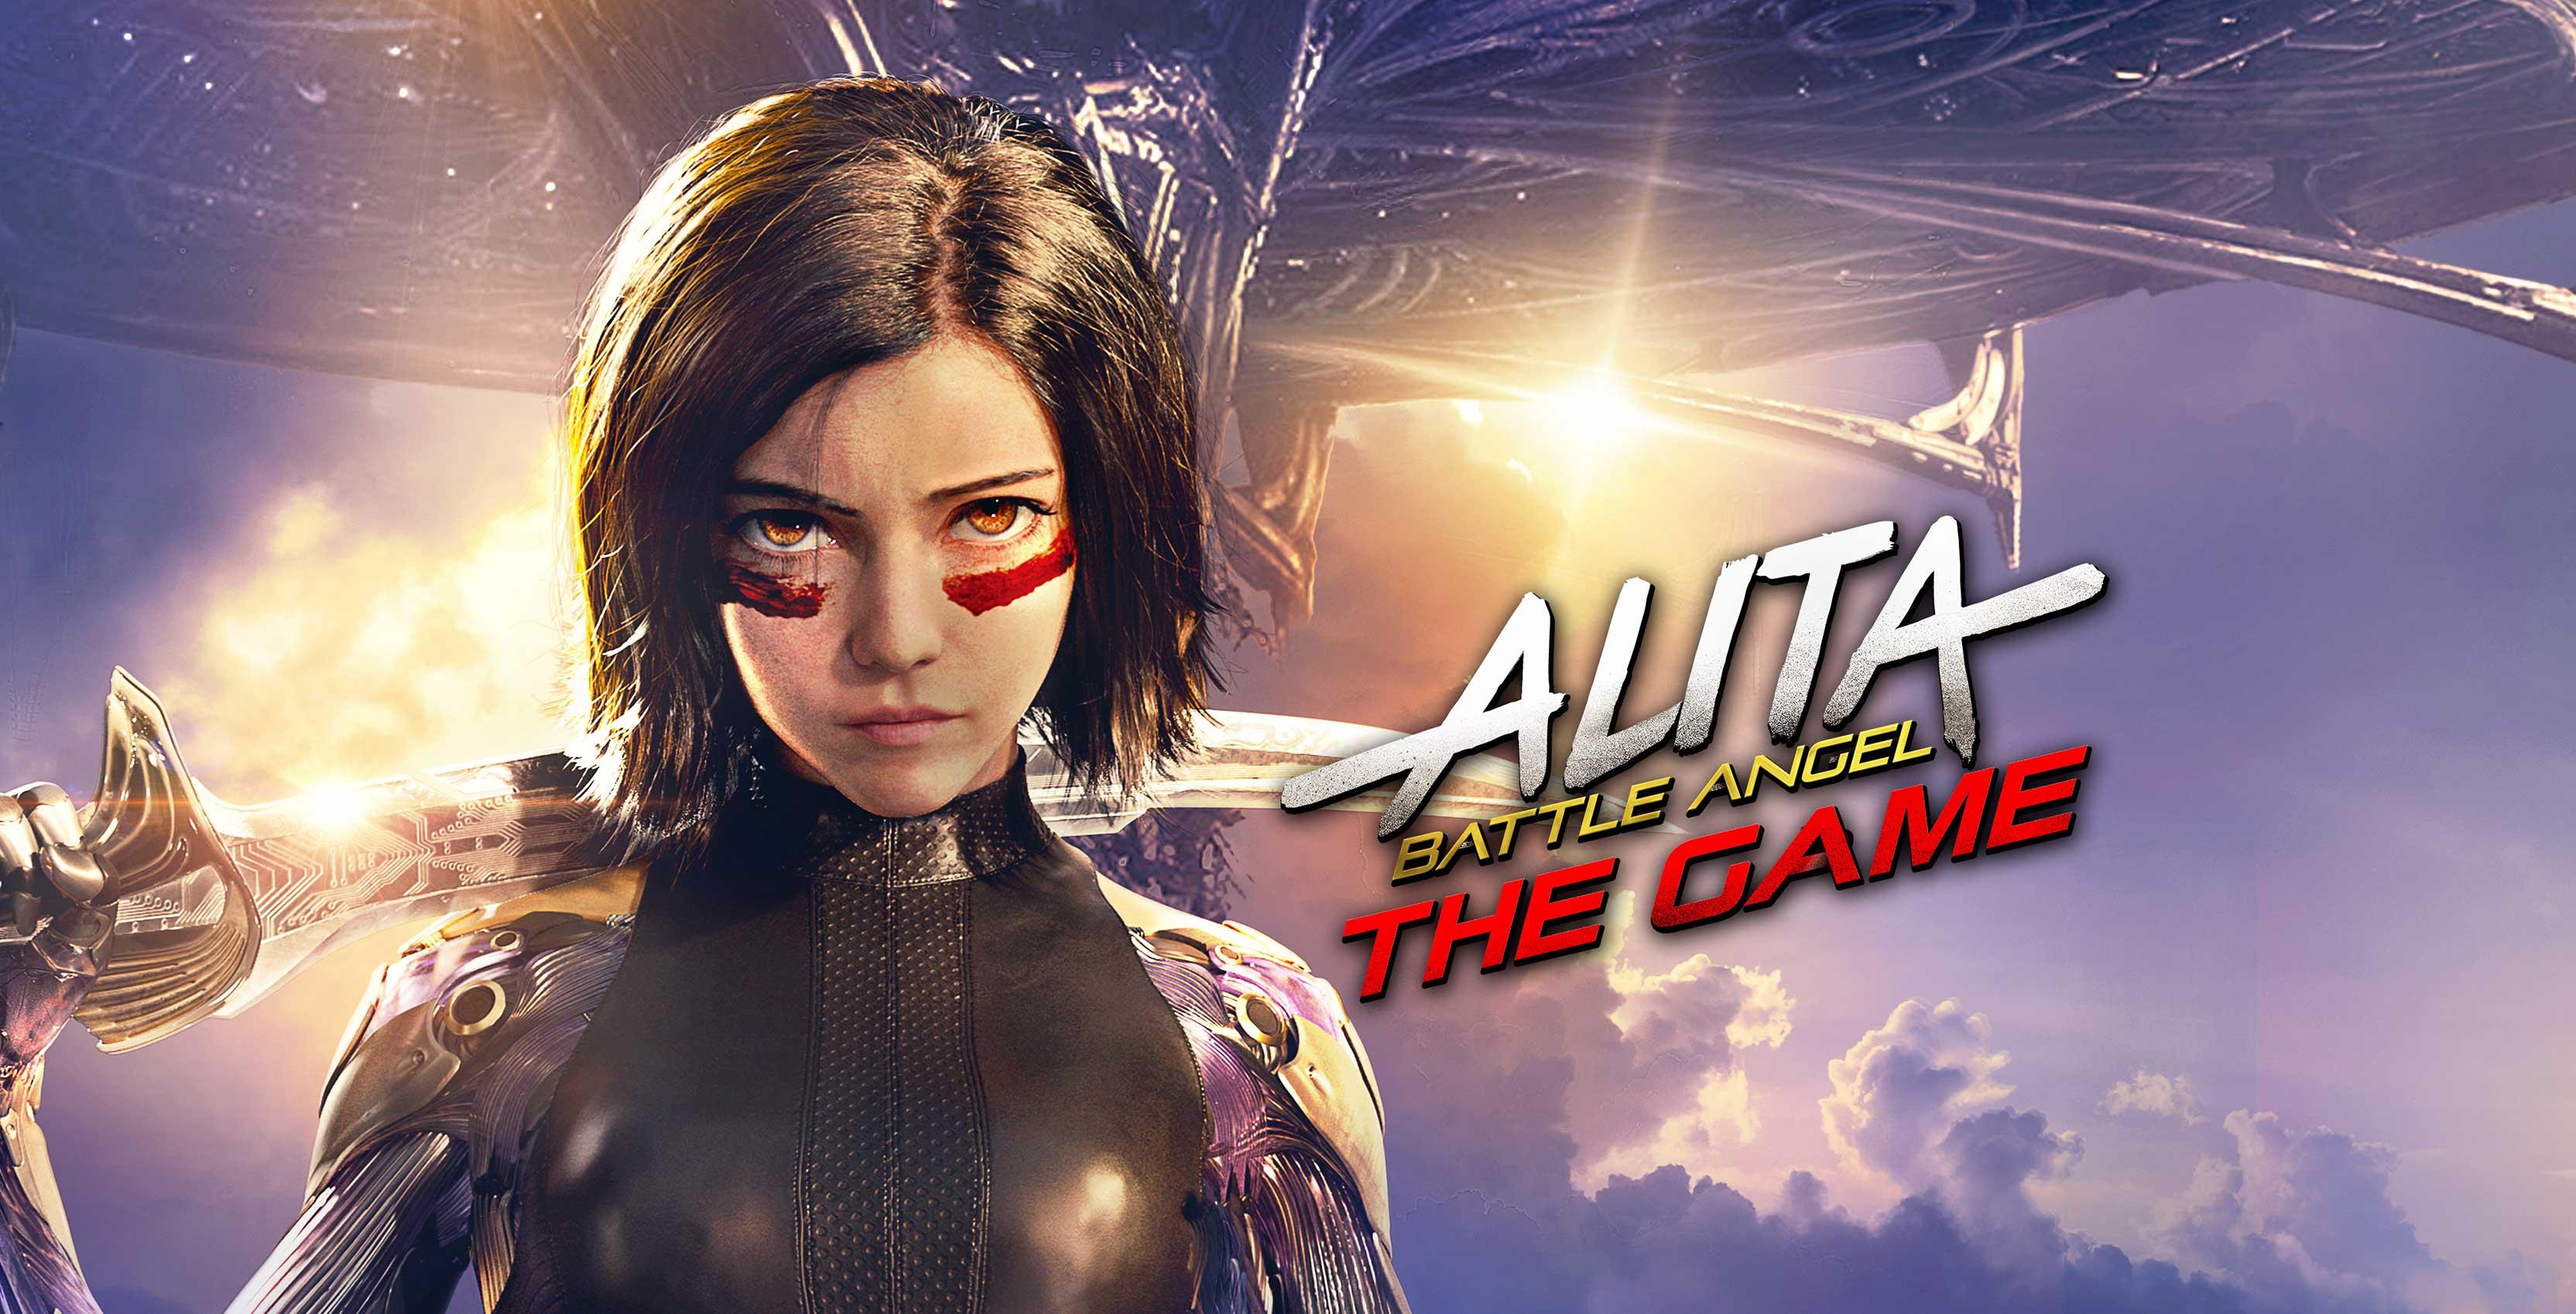 Alita: Battle Angel -- The Game